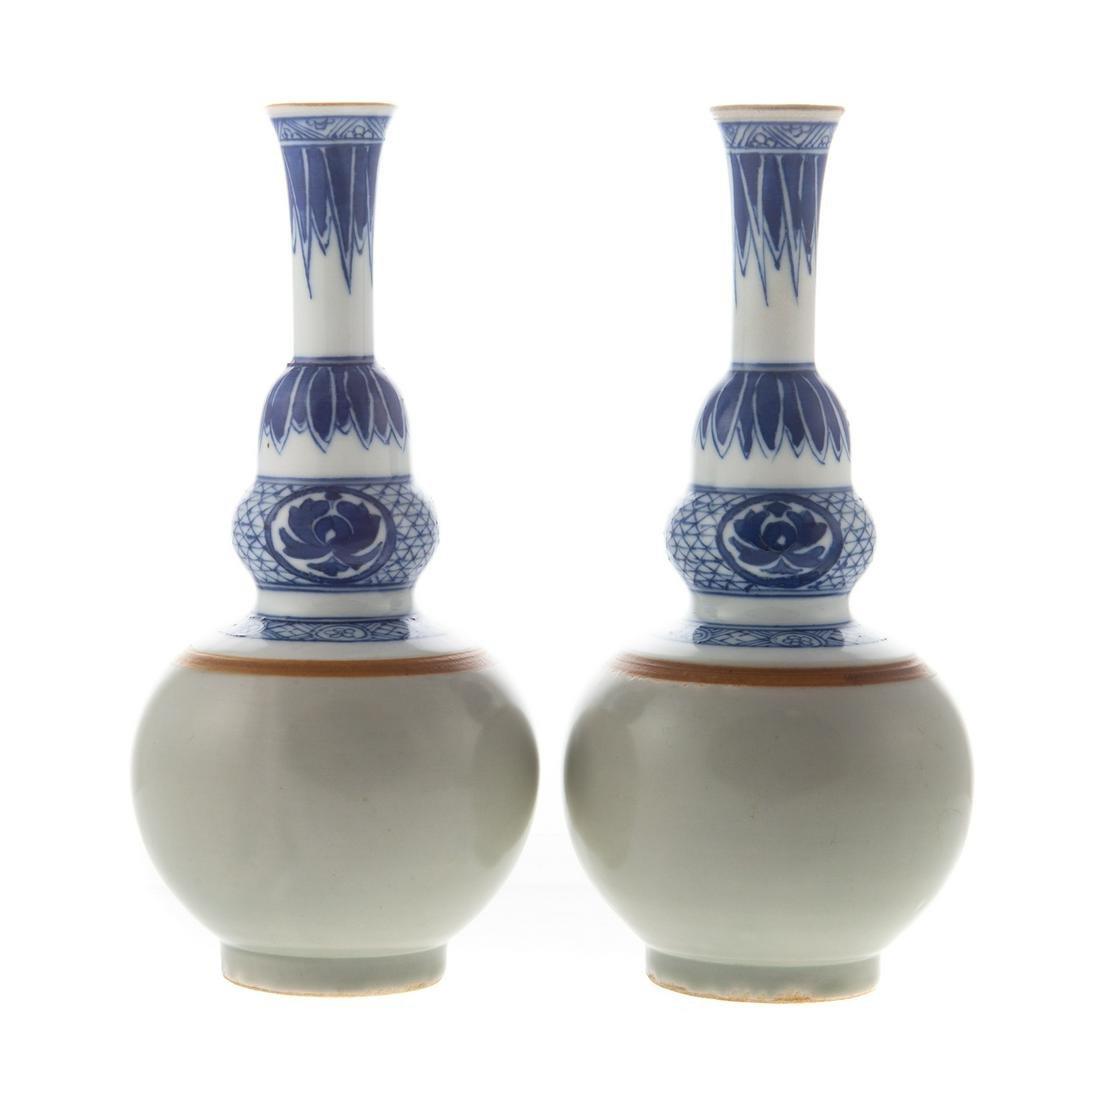 Pair Chinese Celadon/Blue & White Vases